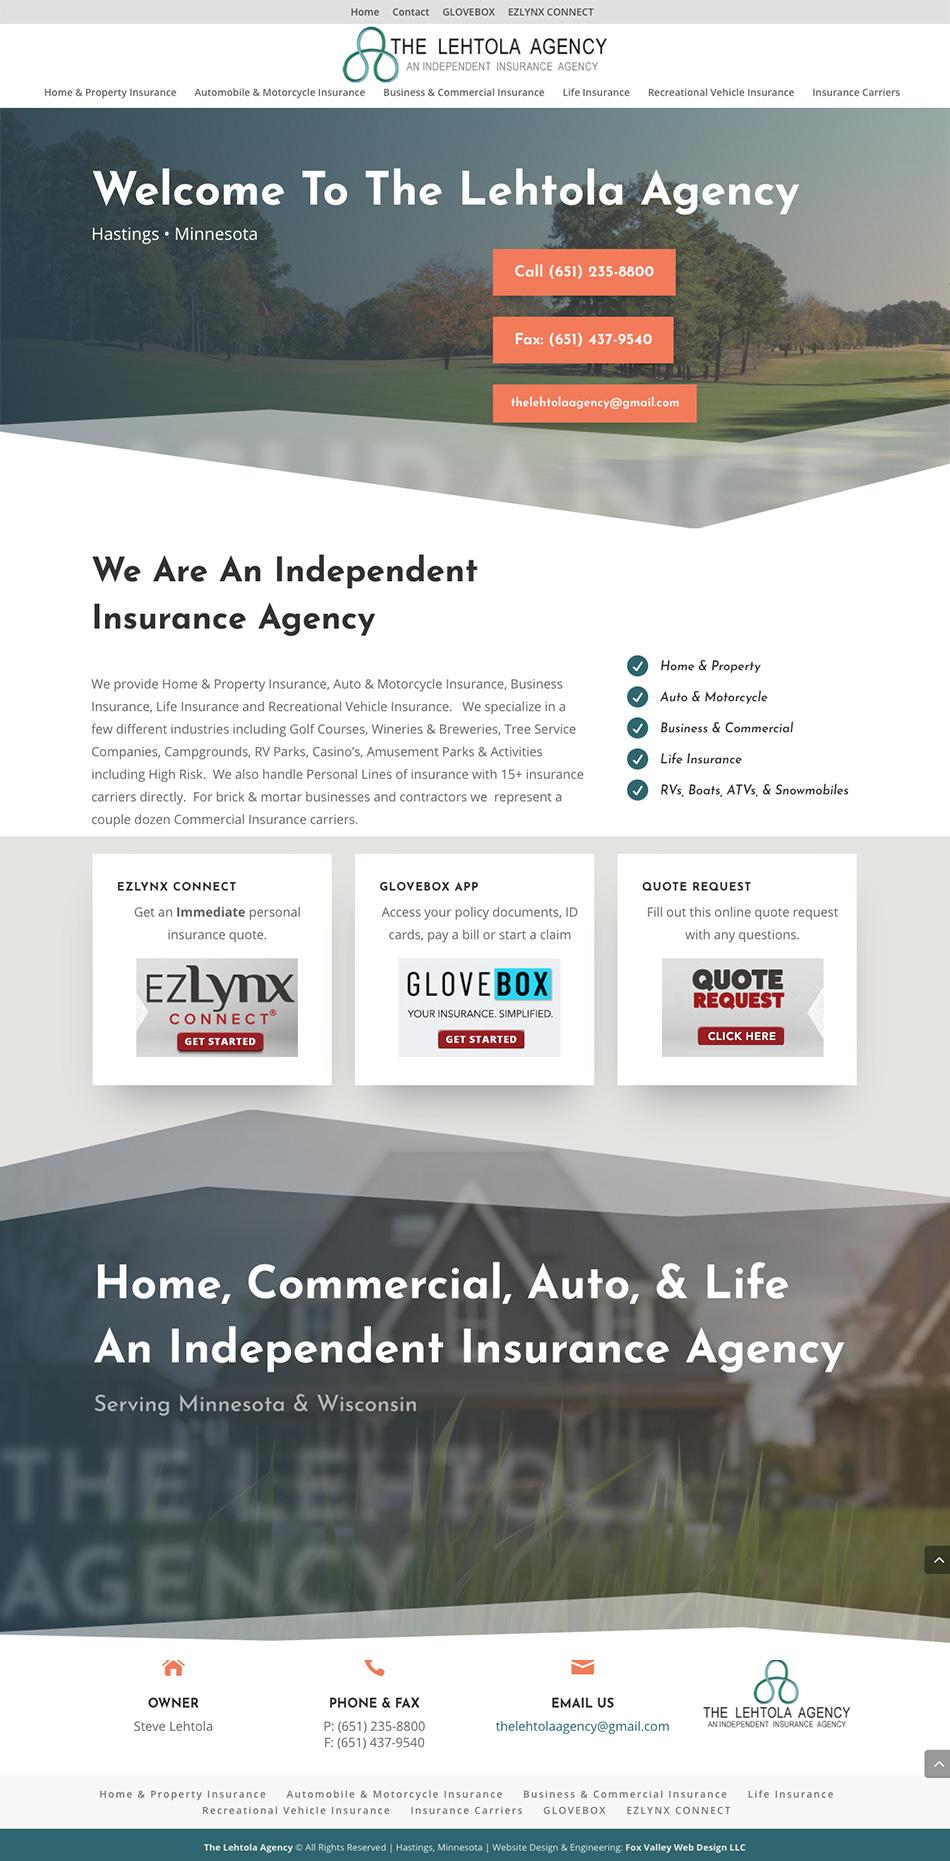 The Lehtola Agency, Home Insurance, Commercial Insurance, Auto Insurance, Life Insurance, Independent Insurance Agency, Get a online insurance quote